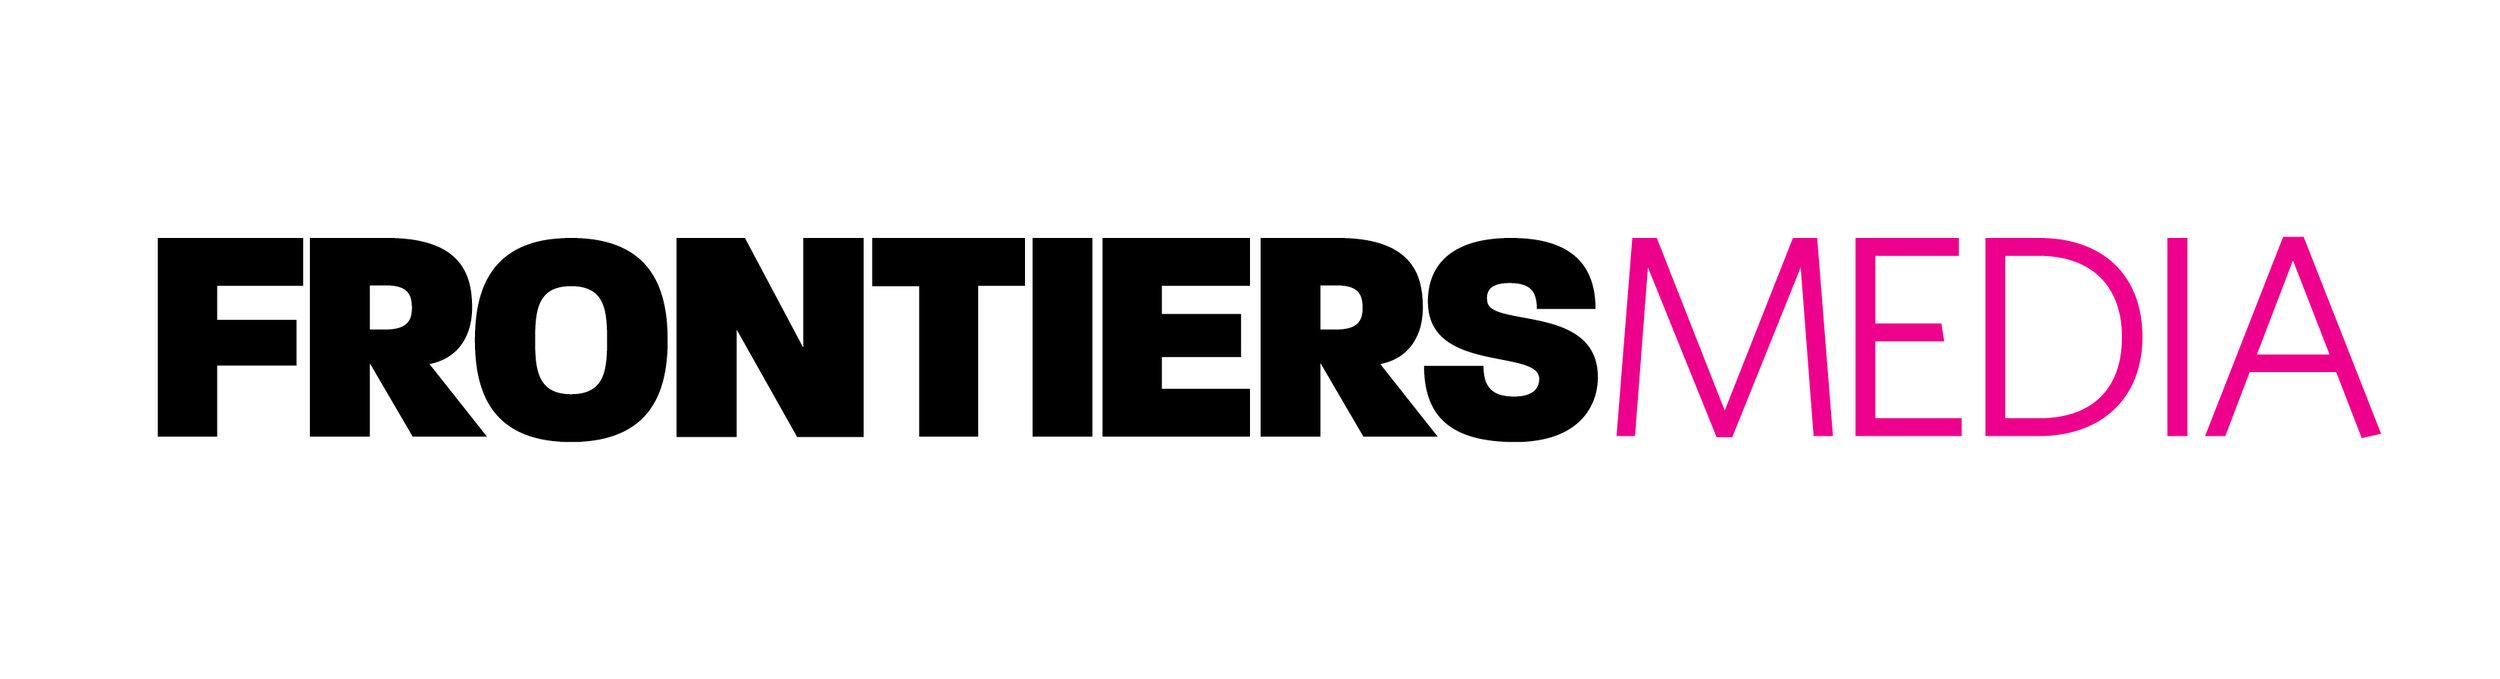 Frontiers Media Logo outlines MASTER1.jpg